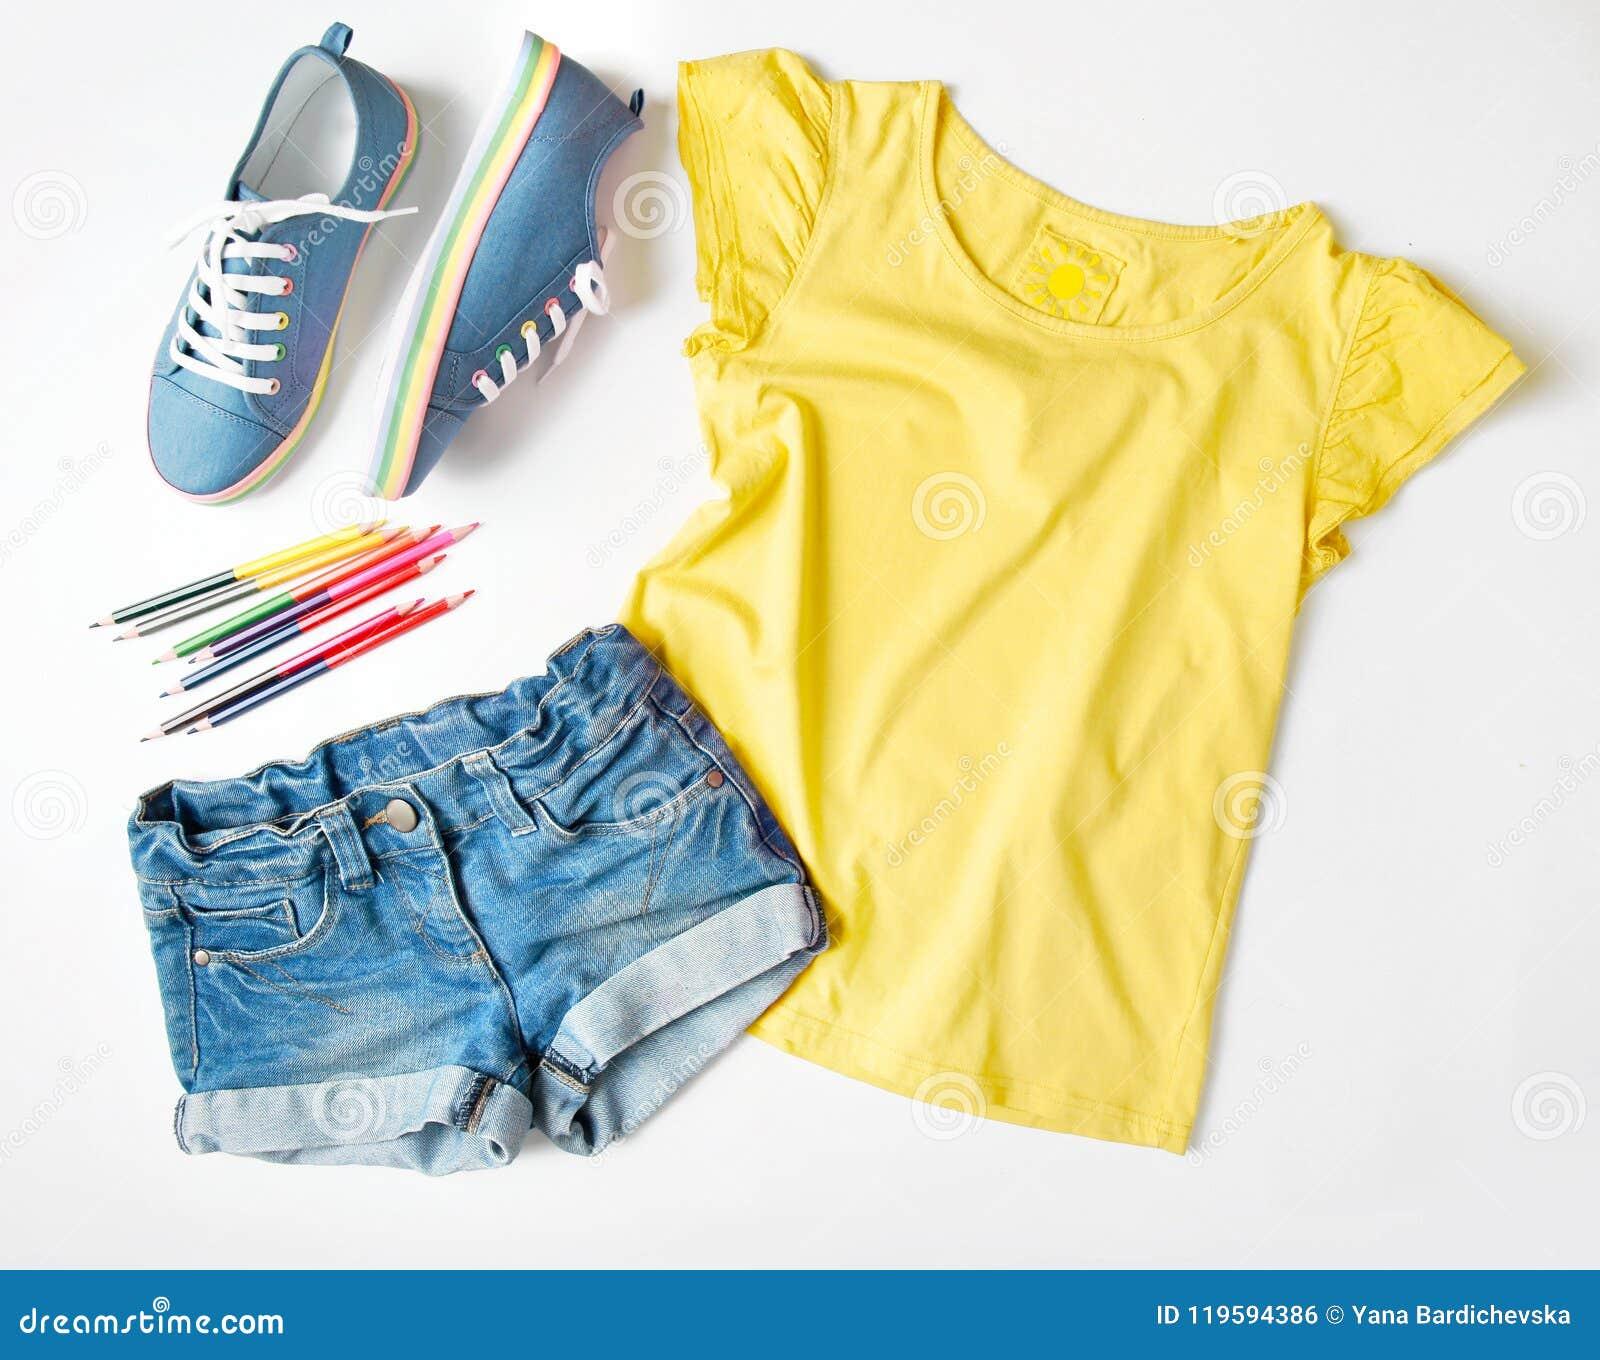 2b1da952b85b Summer Child`s Clothing Set On White. Stock Photo - Image of trendy ...